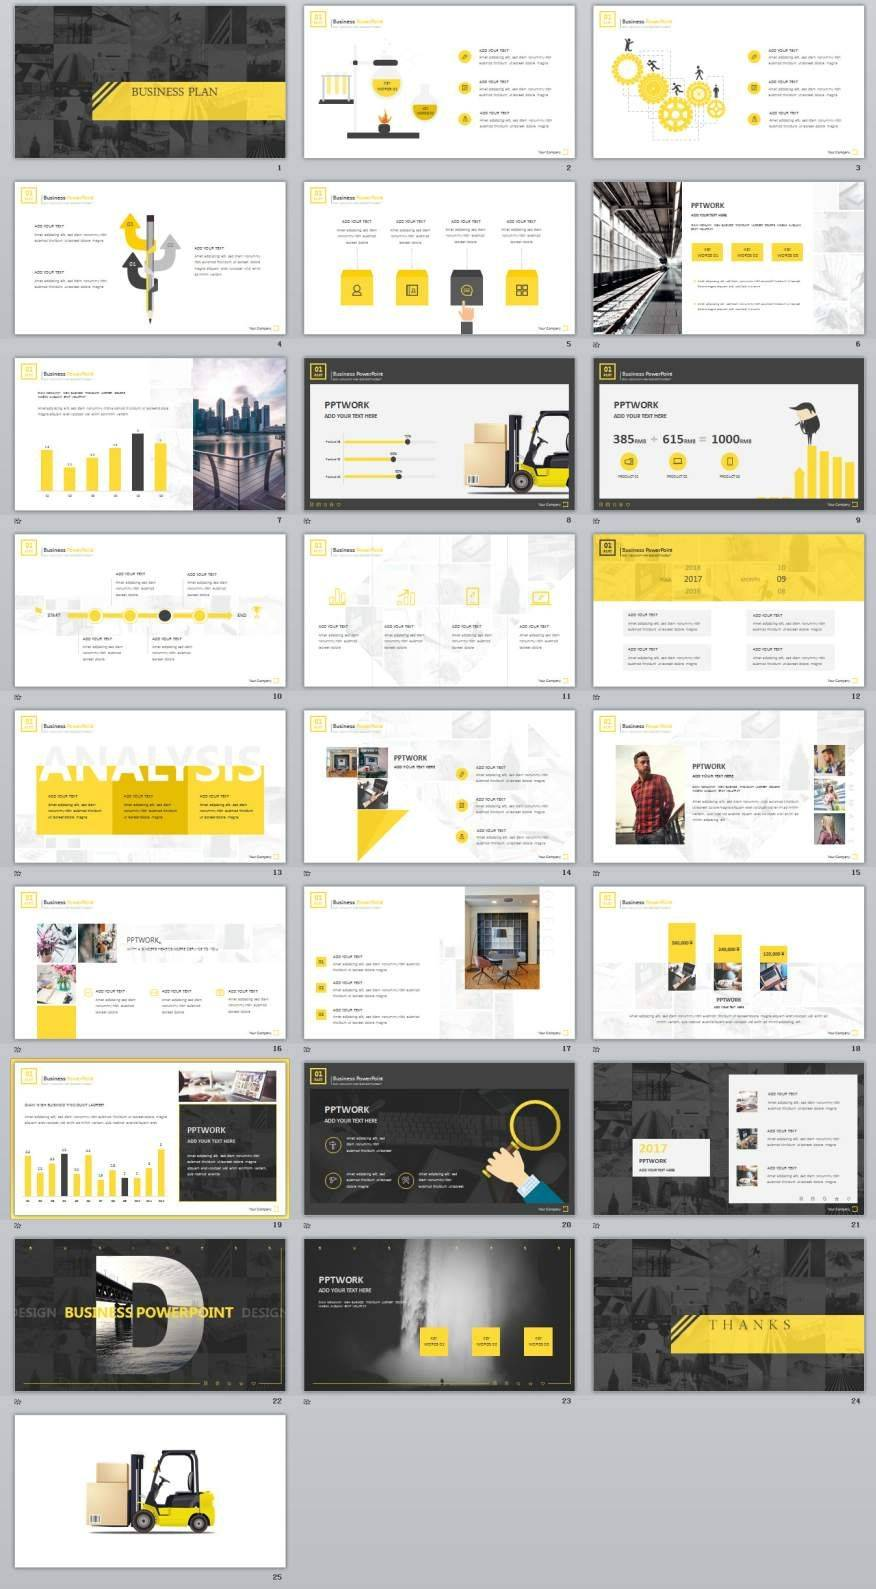 Jafar Business Plan Powerpoint Template Free